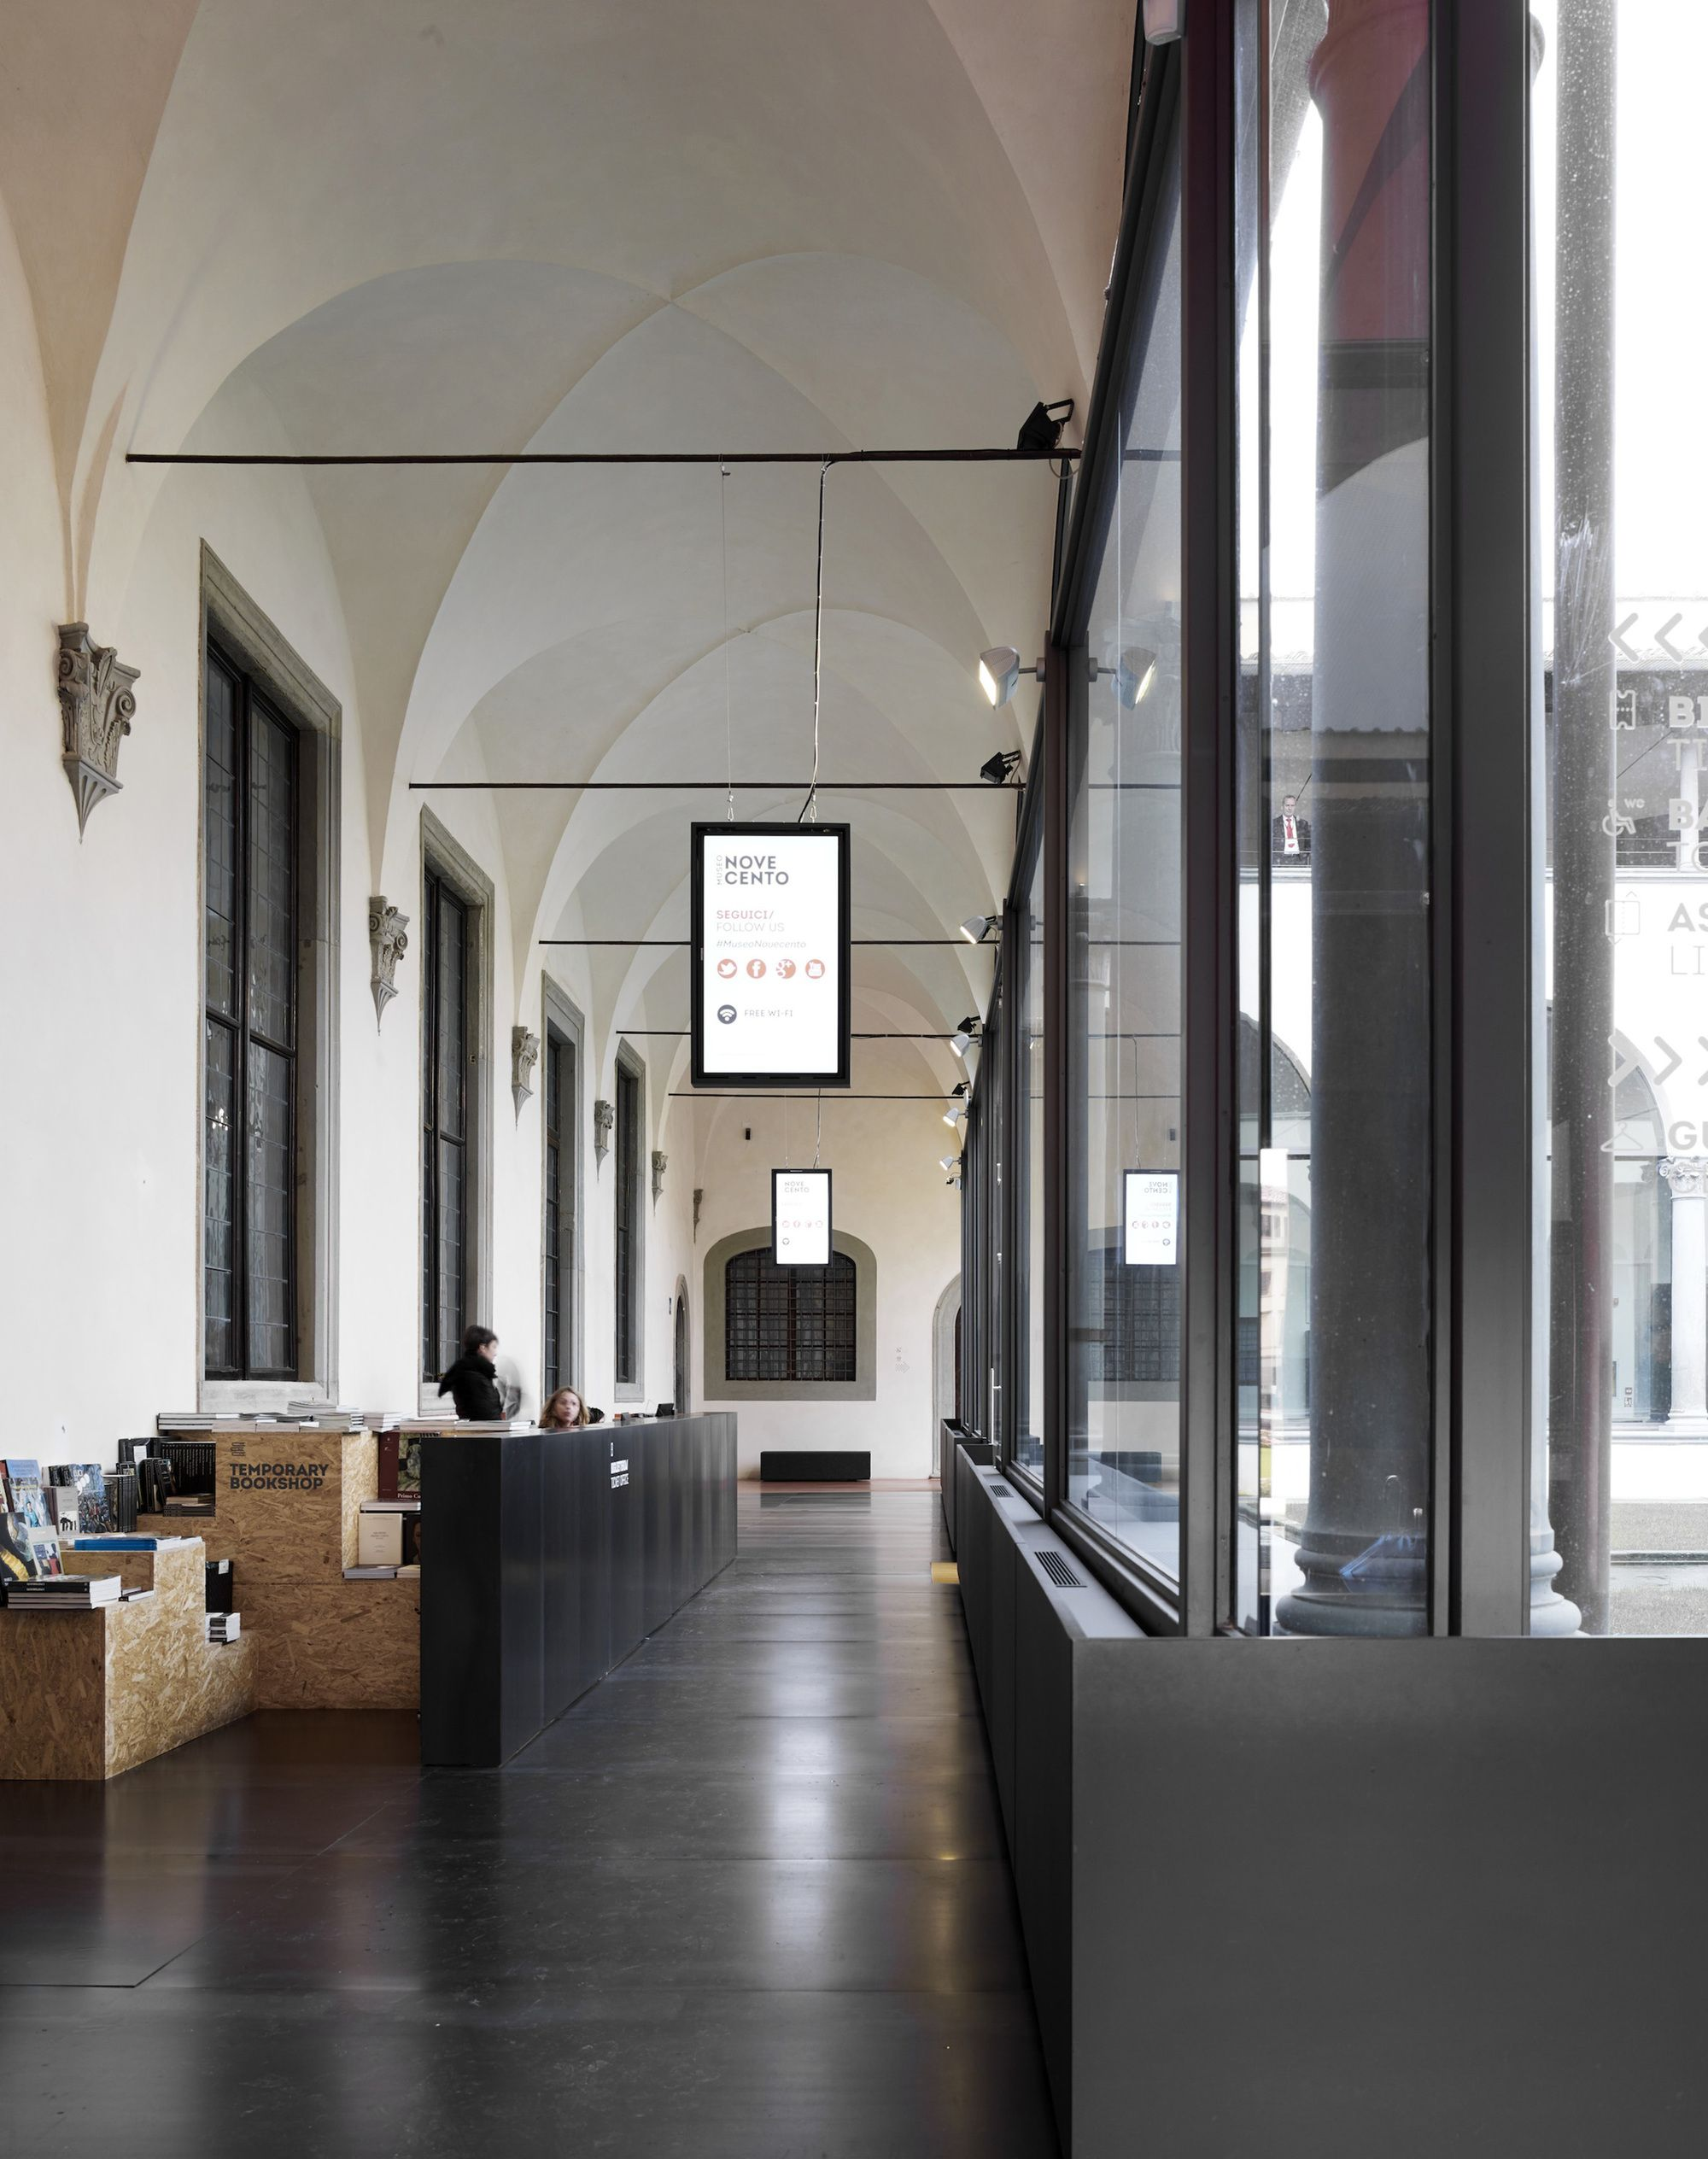 Gallery of the museum of the twentieth century avatar architettura 13